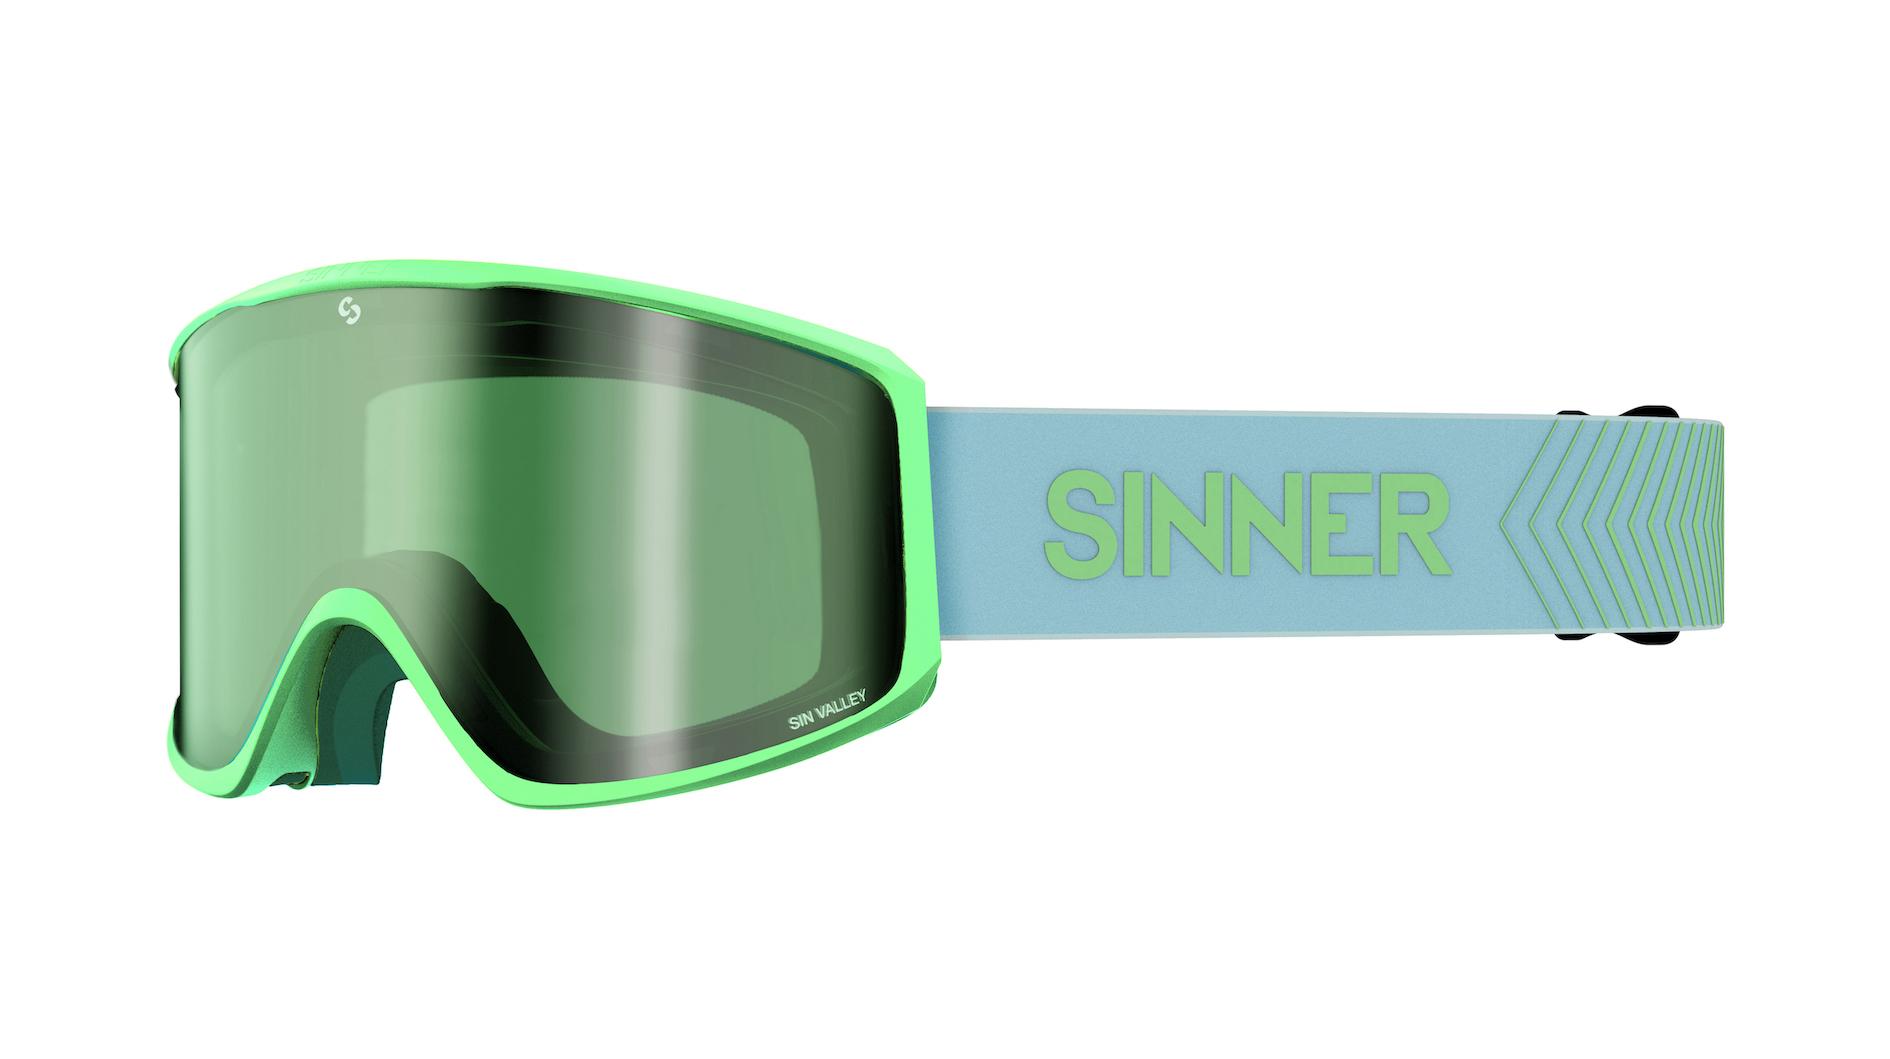 Sinner FW20/21 Goggles